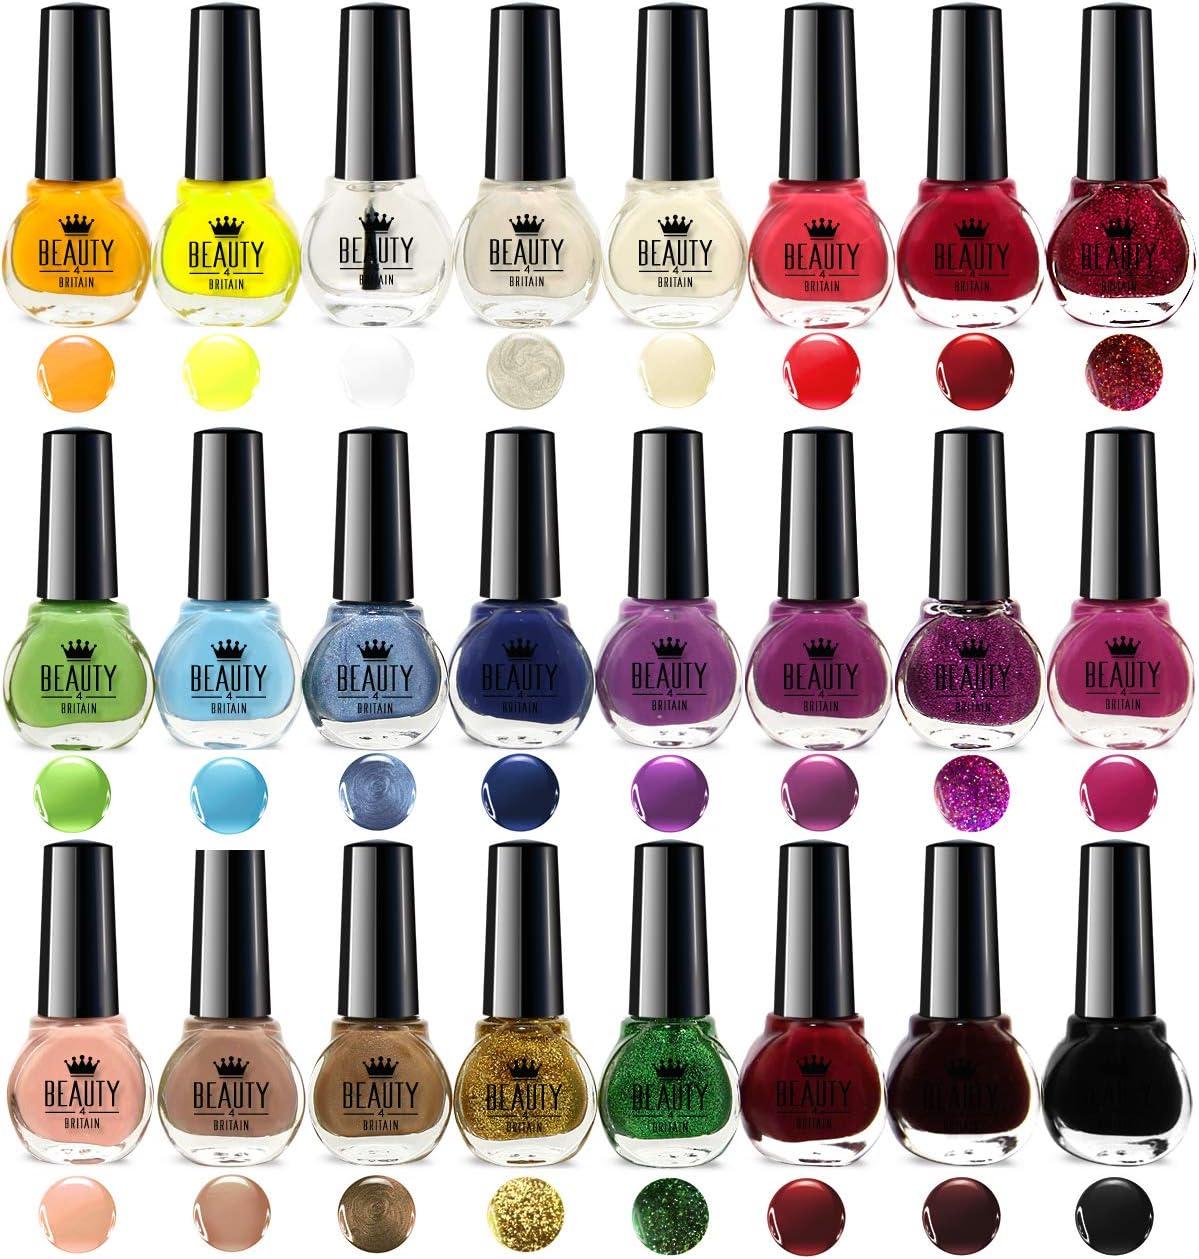 24 X Nail Polish Varnish Set 24 Different Standard Colours Wholesale Best Gift Amazon Co Uk Beauty